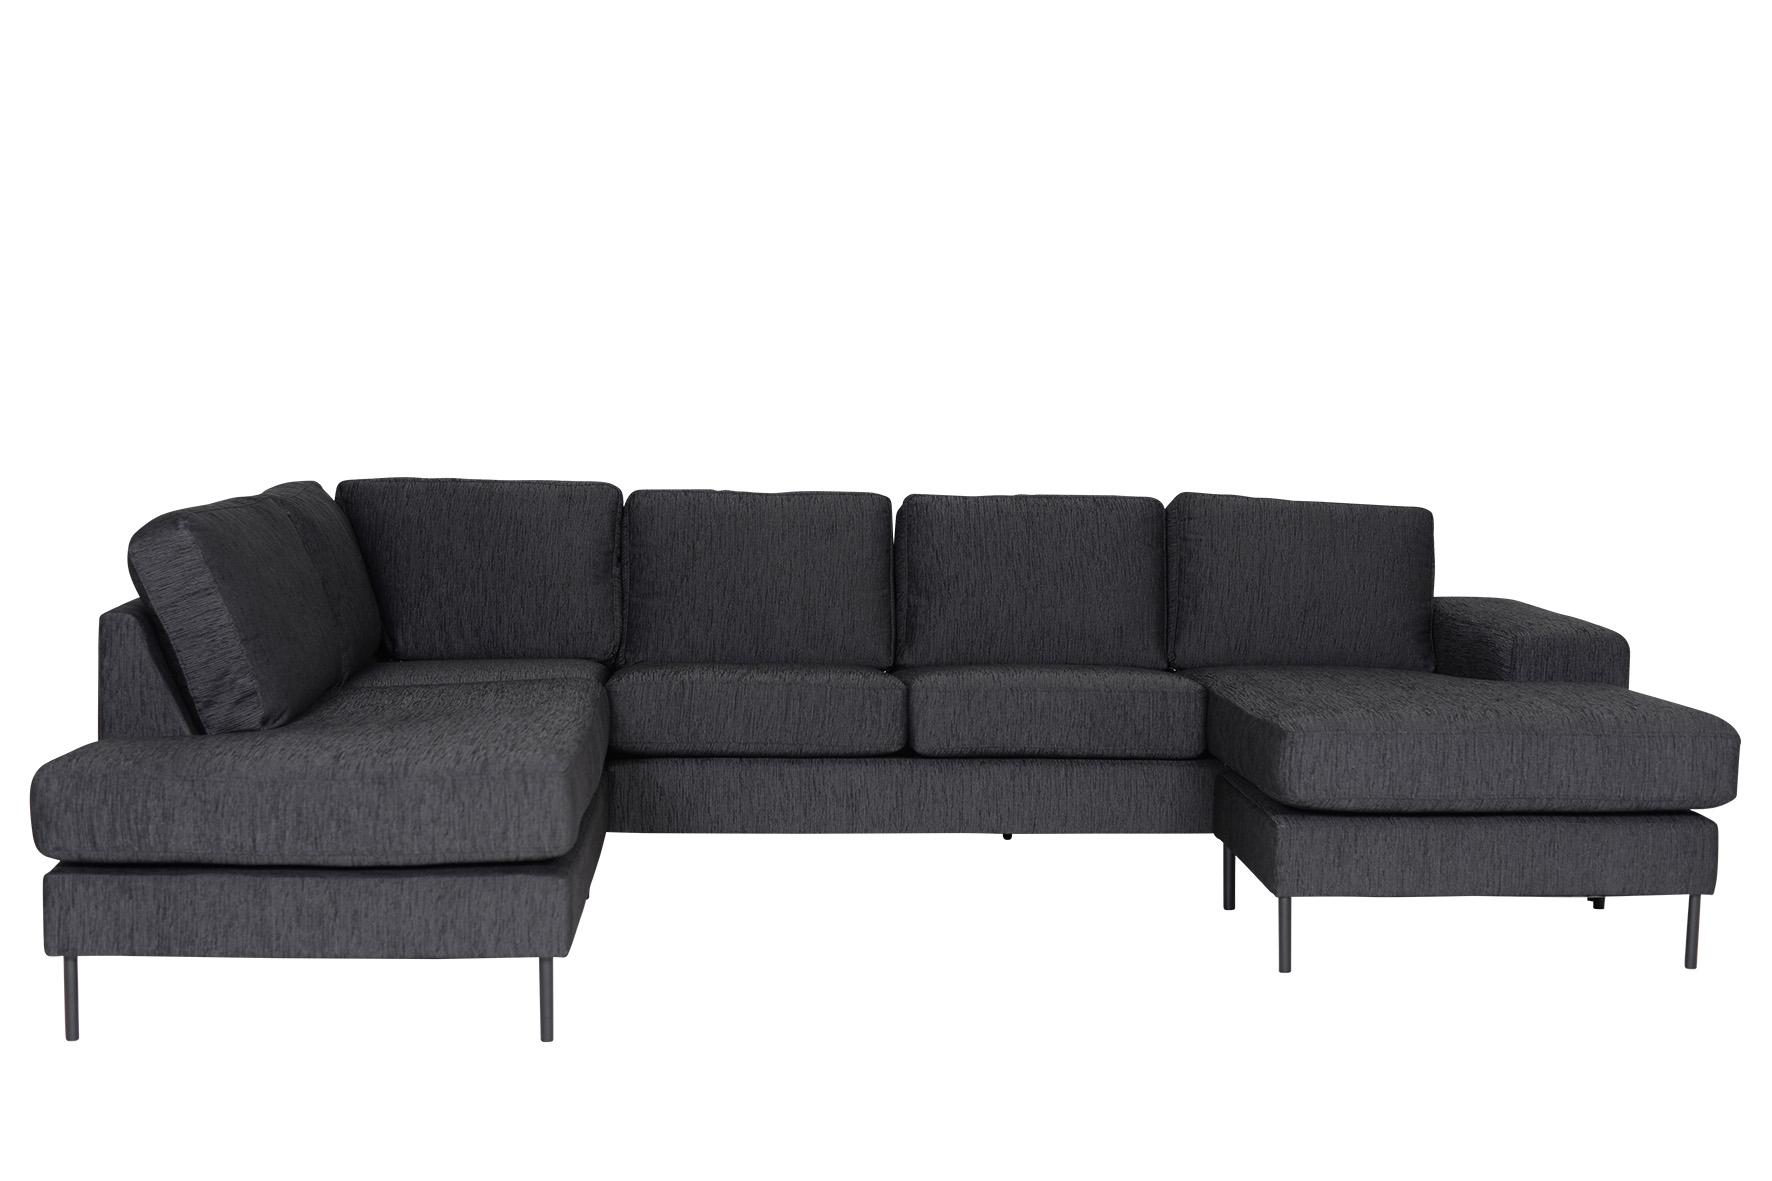 u sofa jonas elegantes zeitloses xxl designer sofa schwarz mdv h. Black Bedroom Furniture Sets. Home Design Ideas